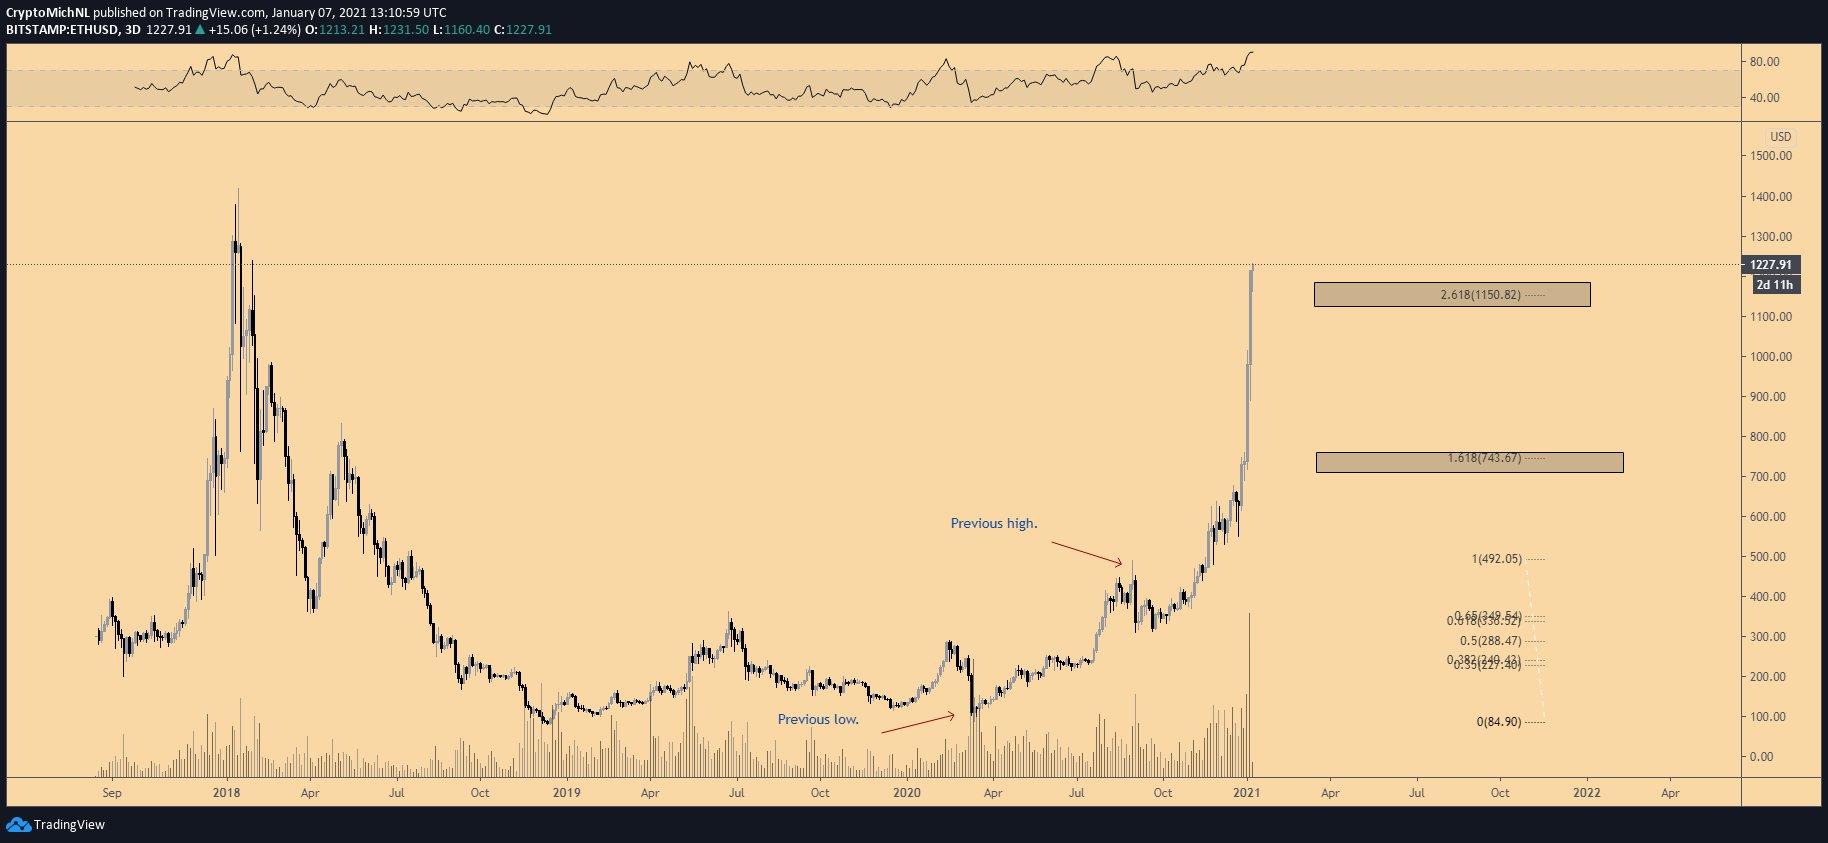 Аналитика цены Ethereum за январь 2021 года, график 1.